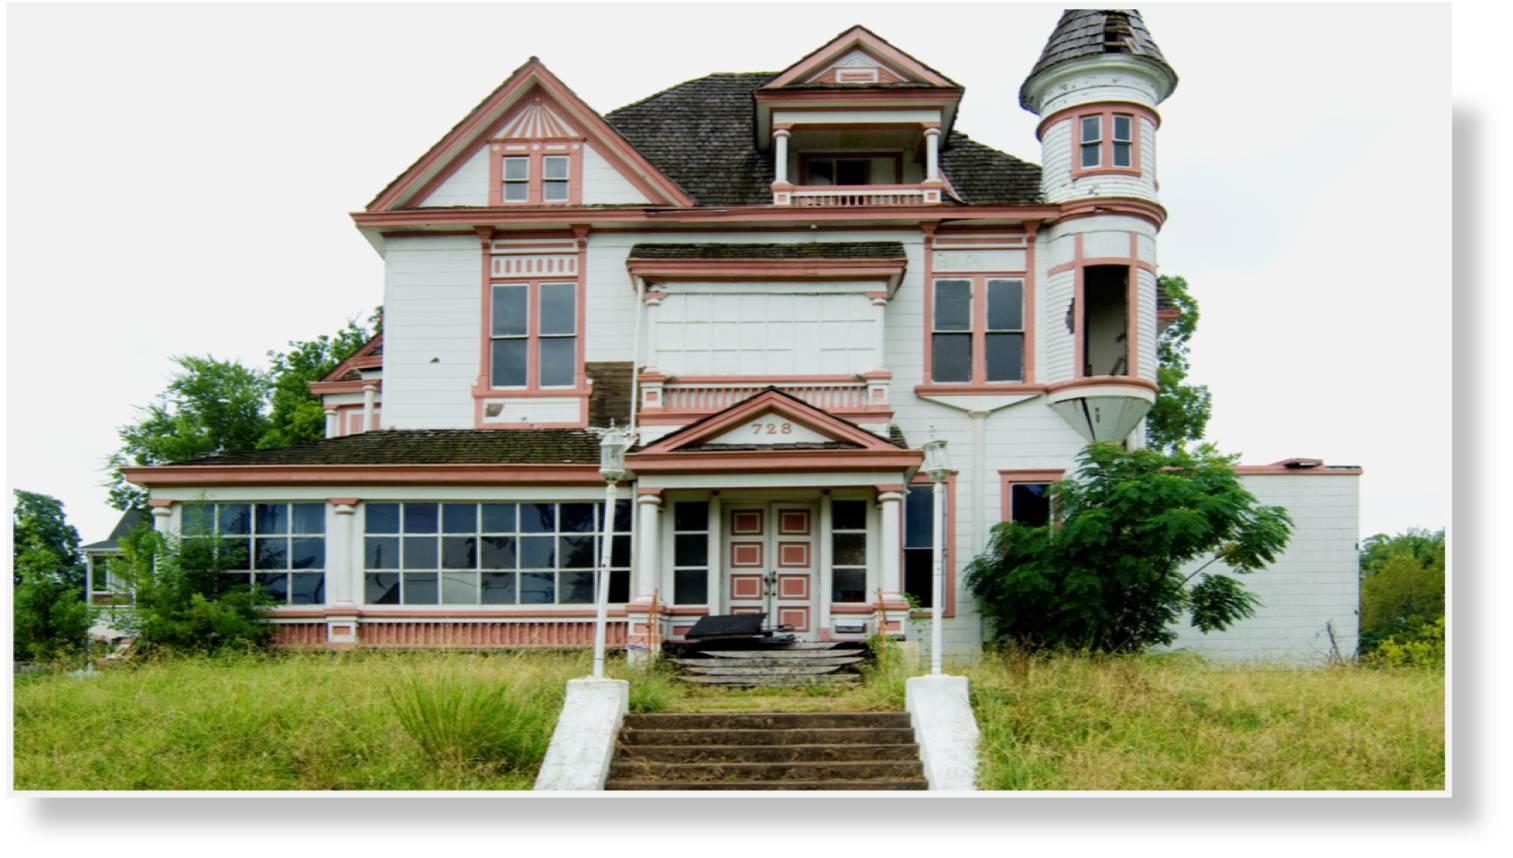 Endangered Louisiana Ogilvie Wiener House 1889